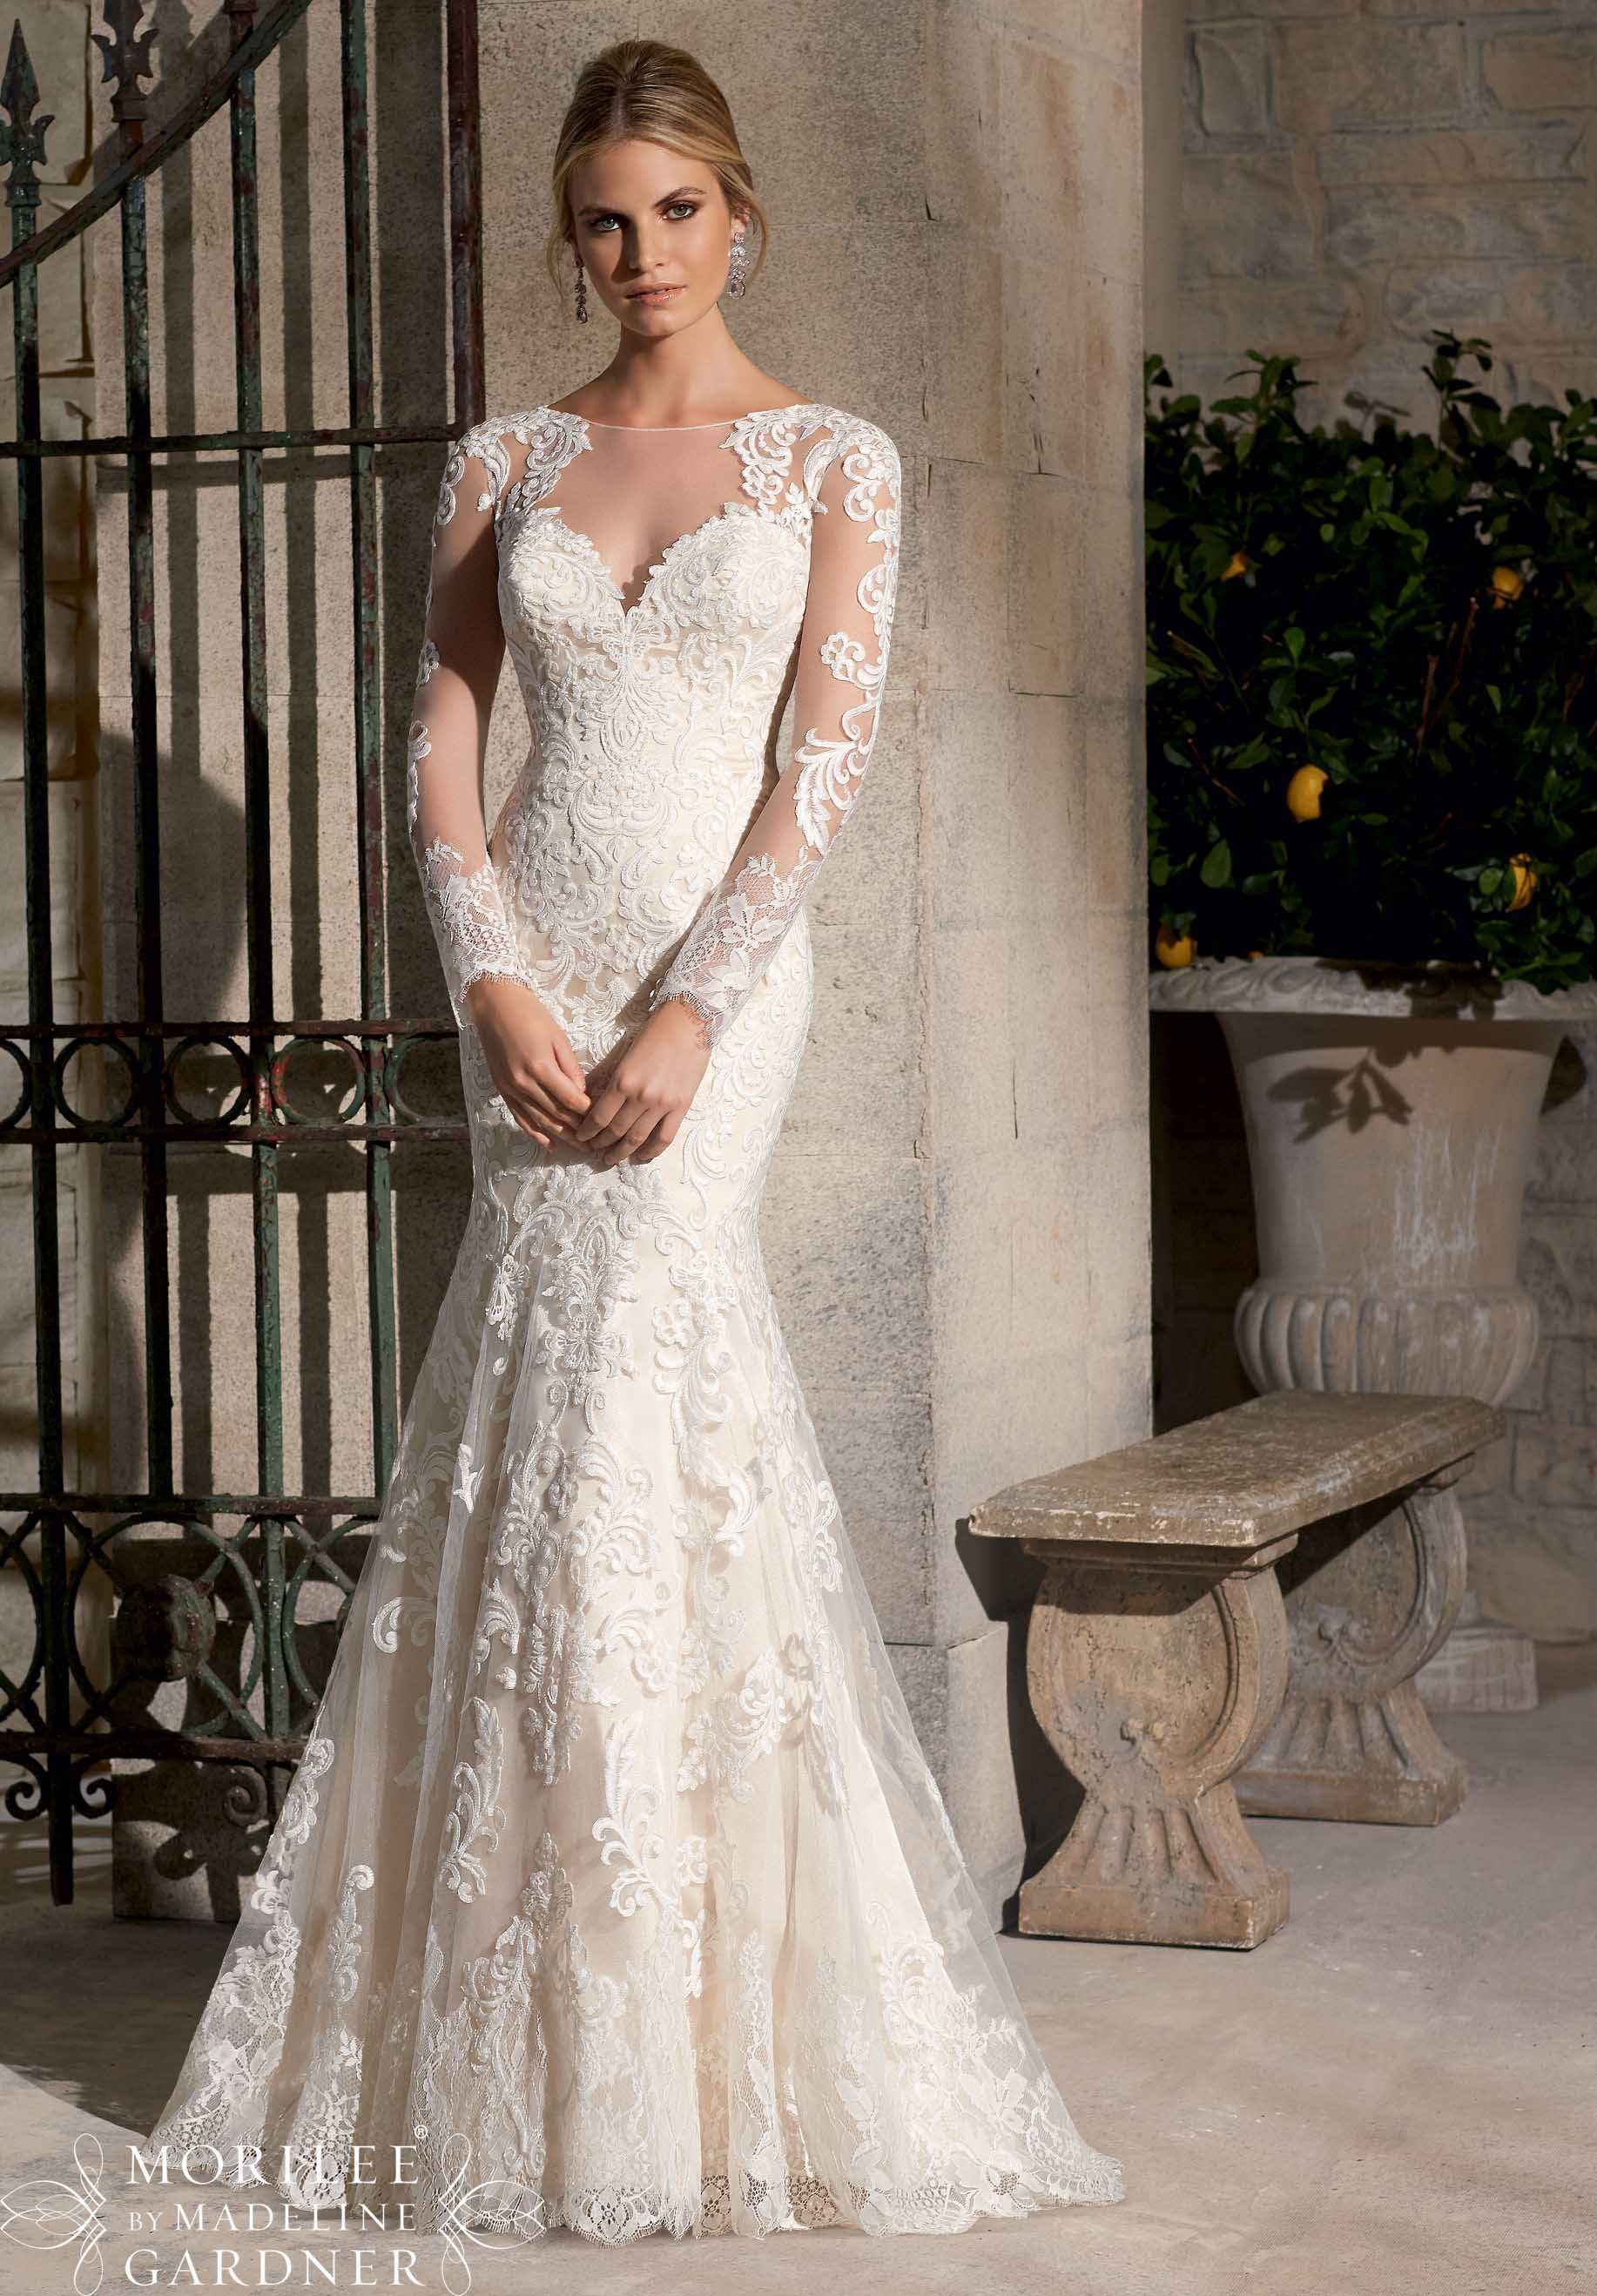 Beautiful vintage wedding dresses not white in wedding